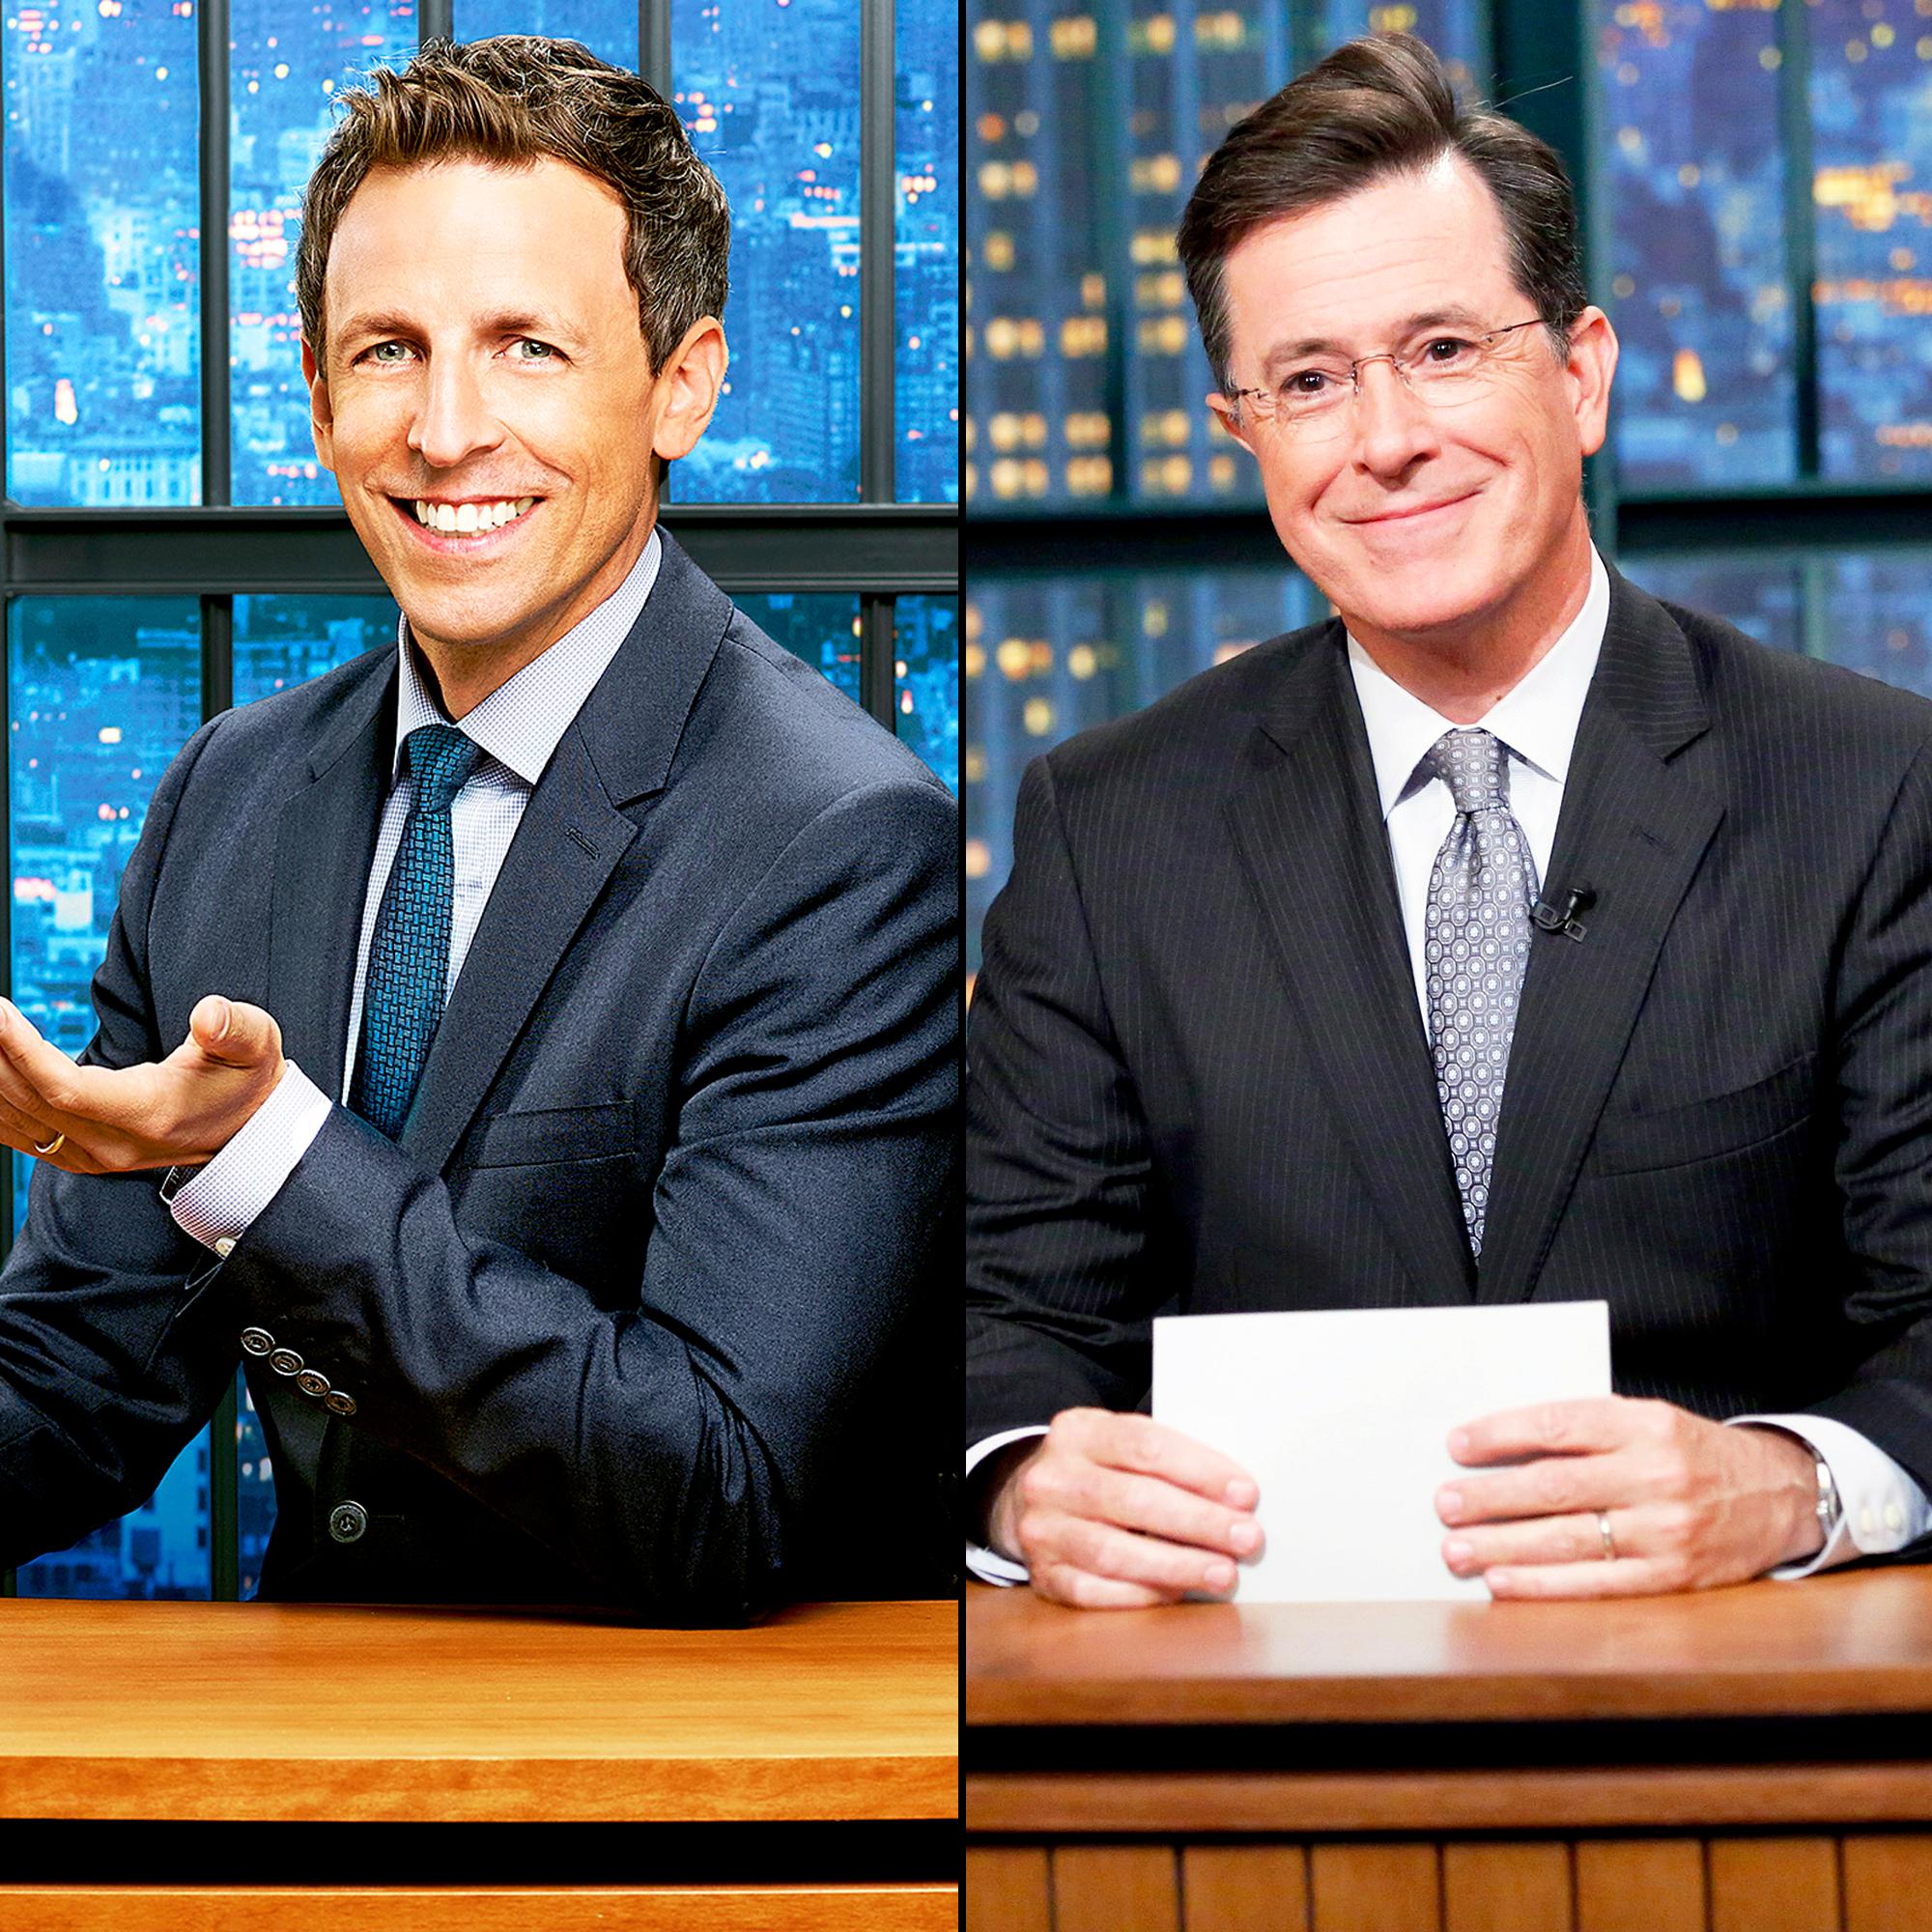 Seth Meyers and Stephen Colbert